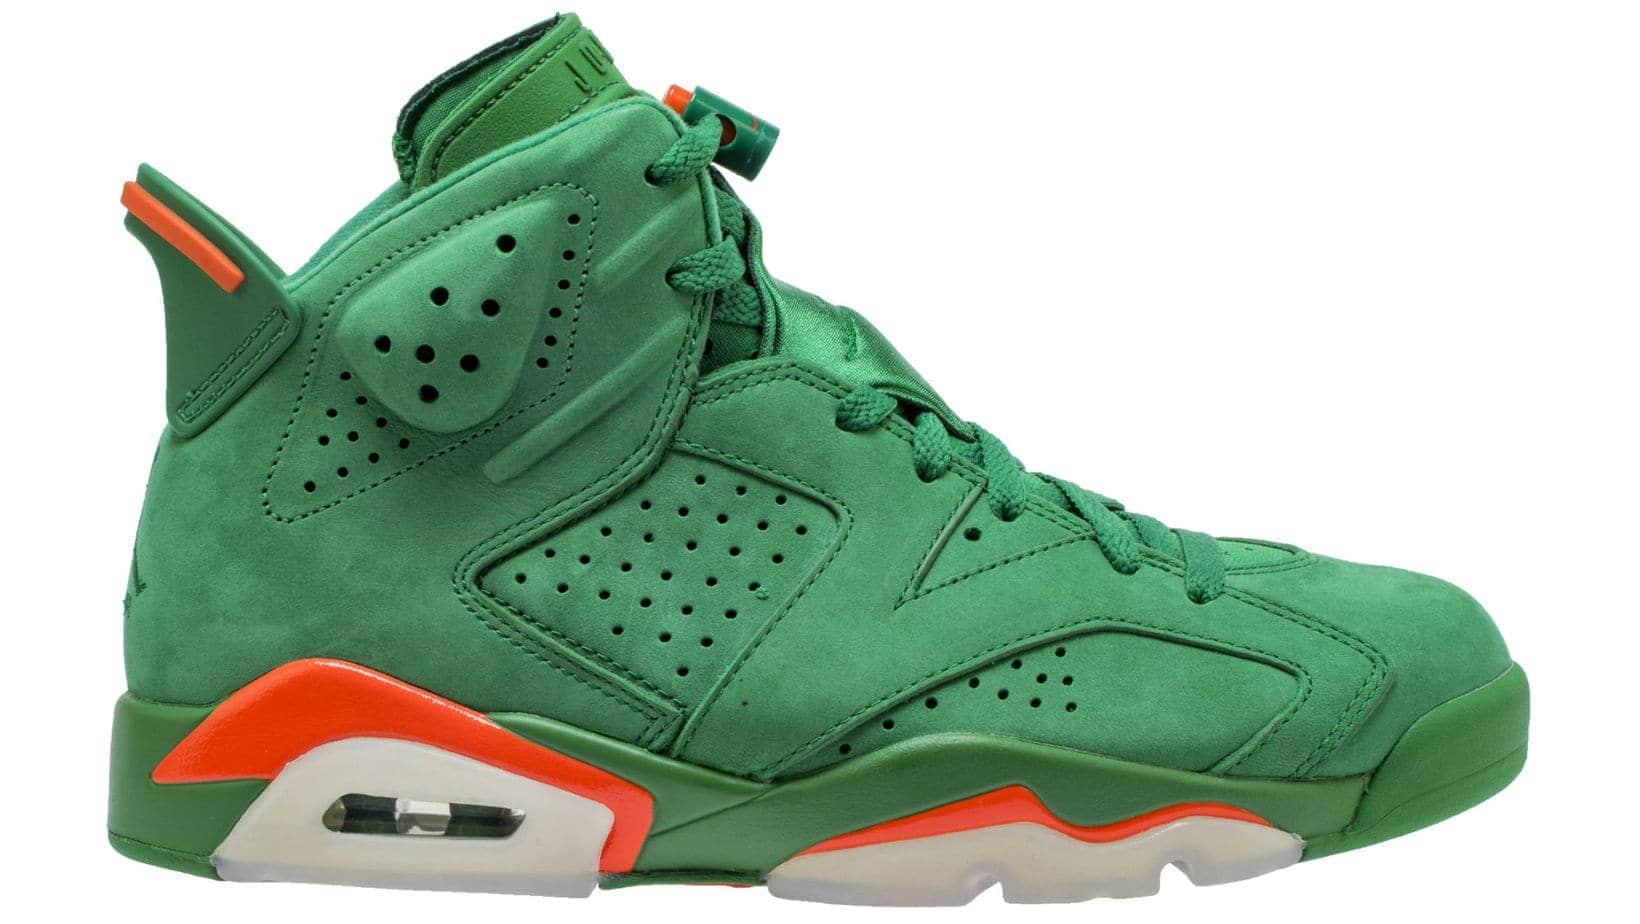 Jordan shoes release date in Perth